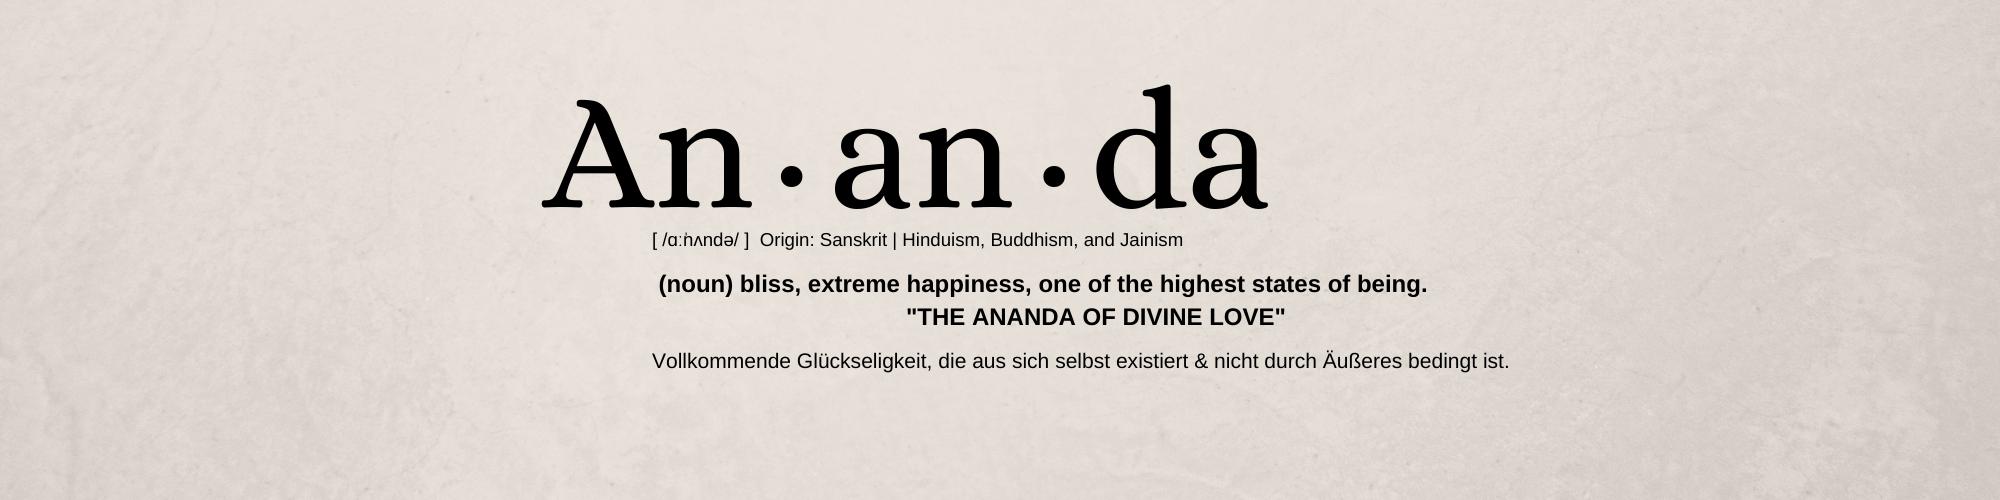 Ananda World Bedeutung